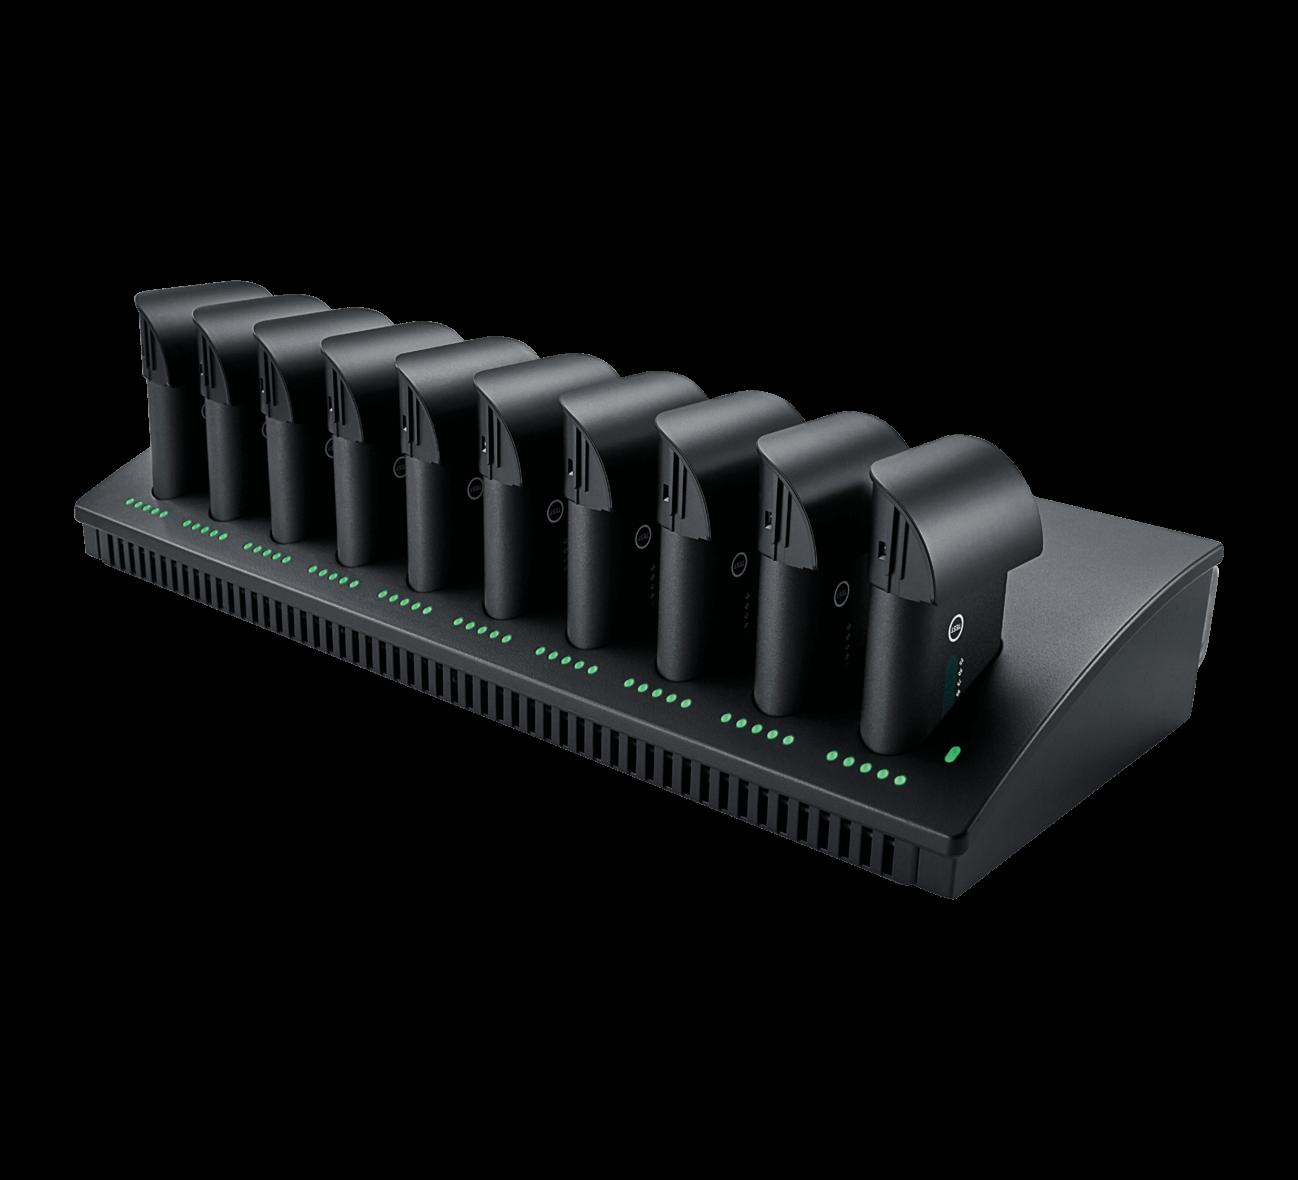 Bateria recargable para mxcw-640-Sb930